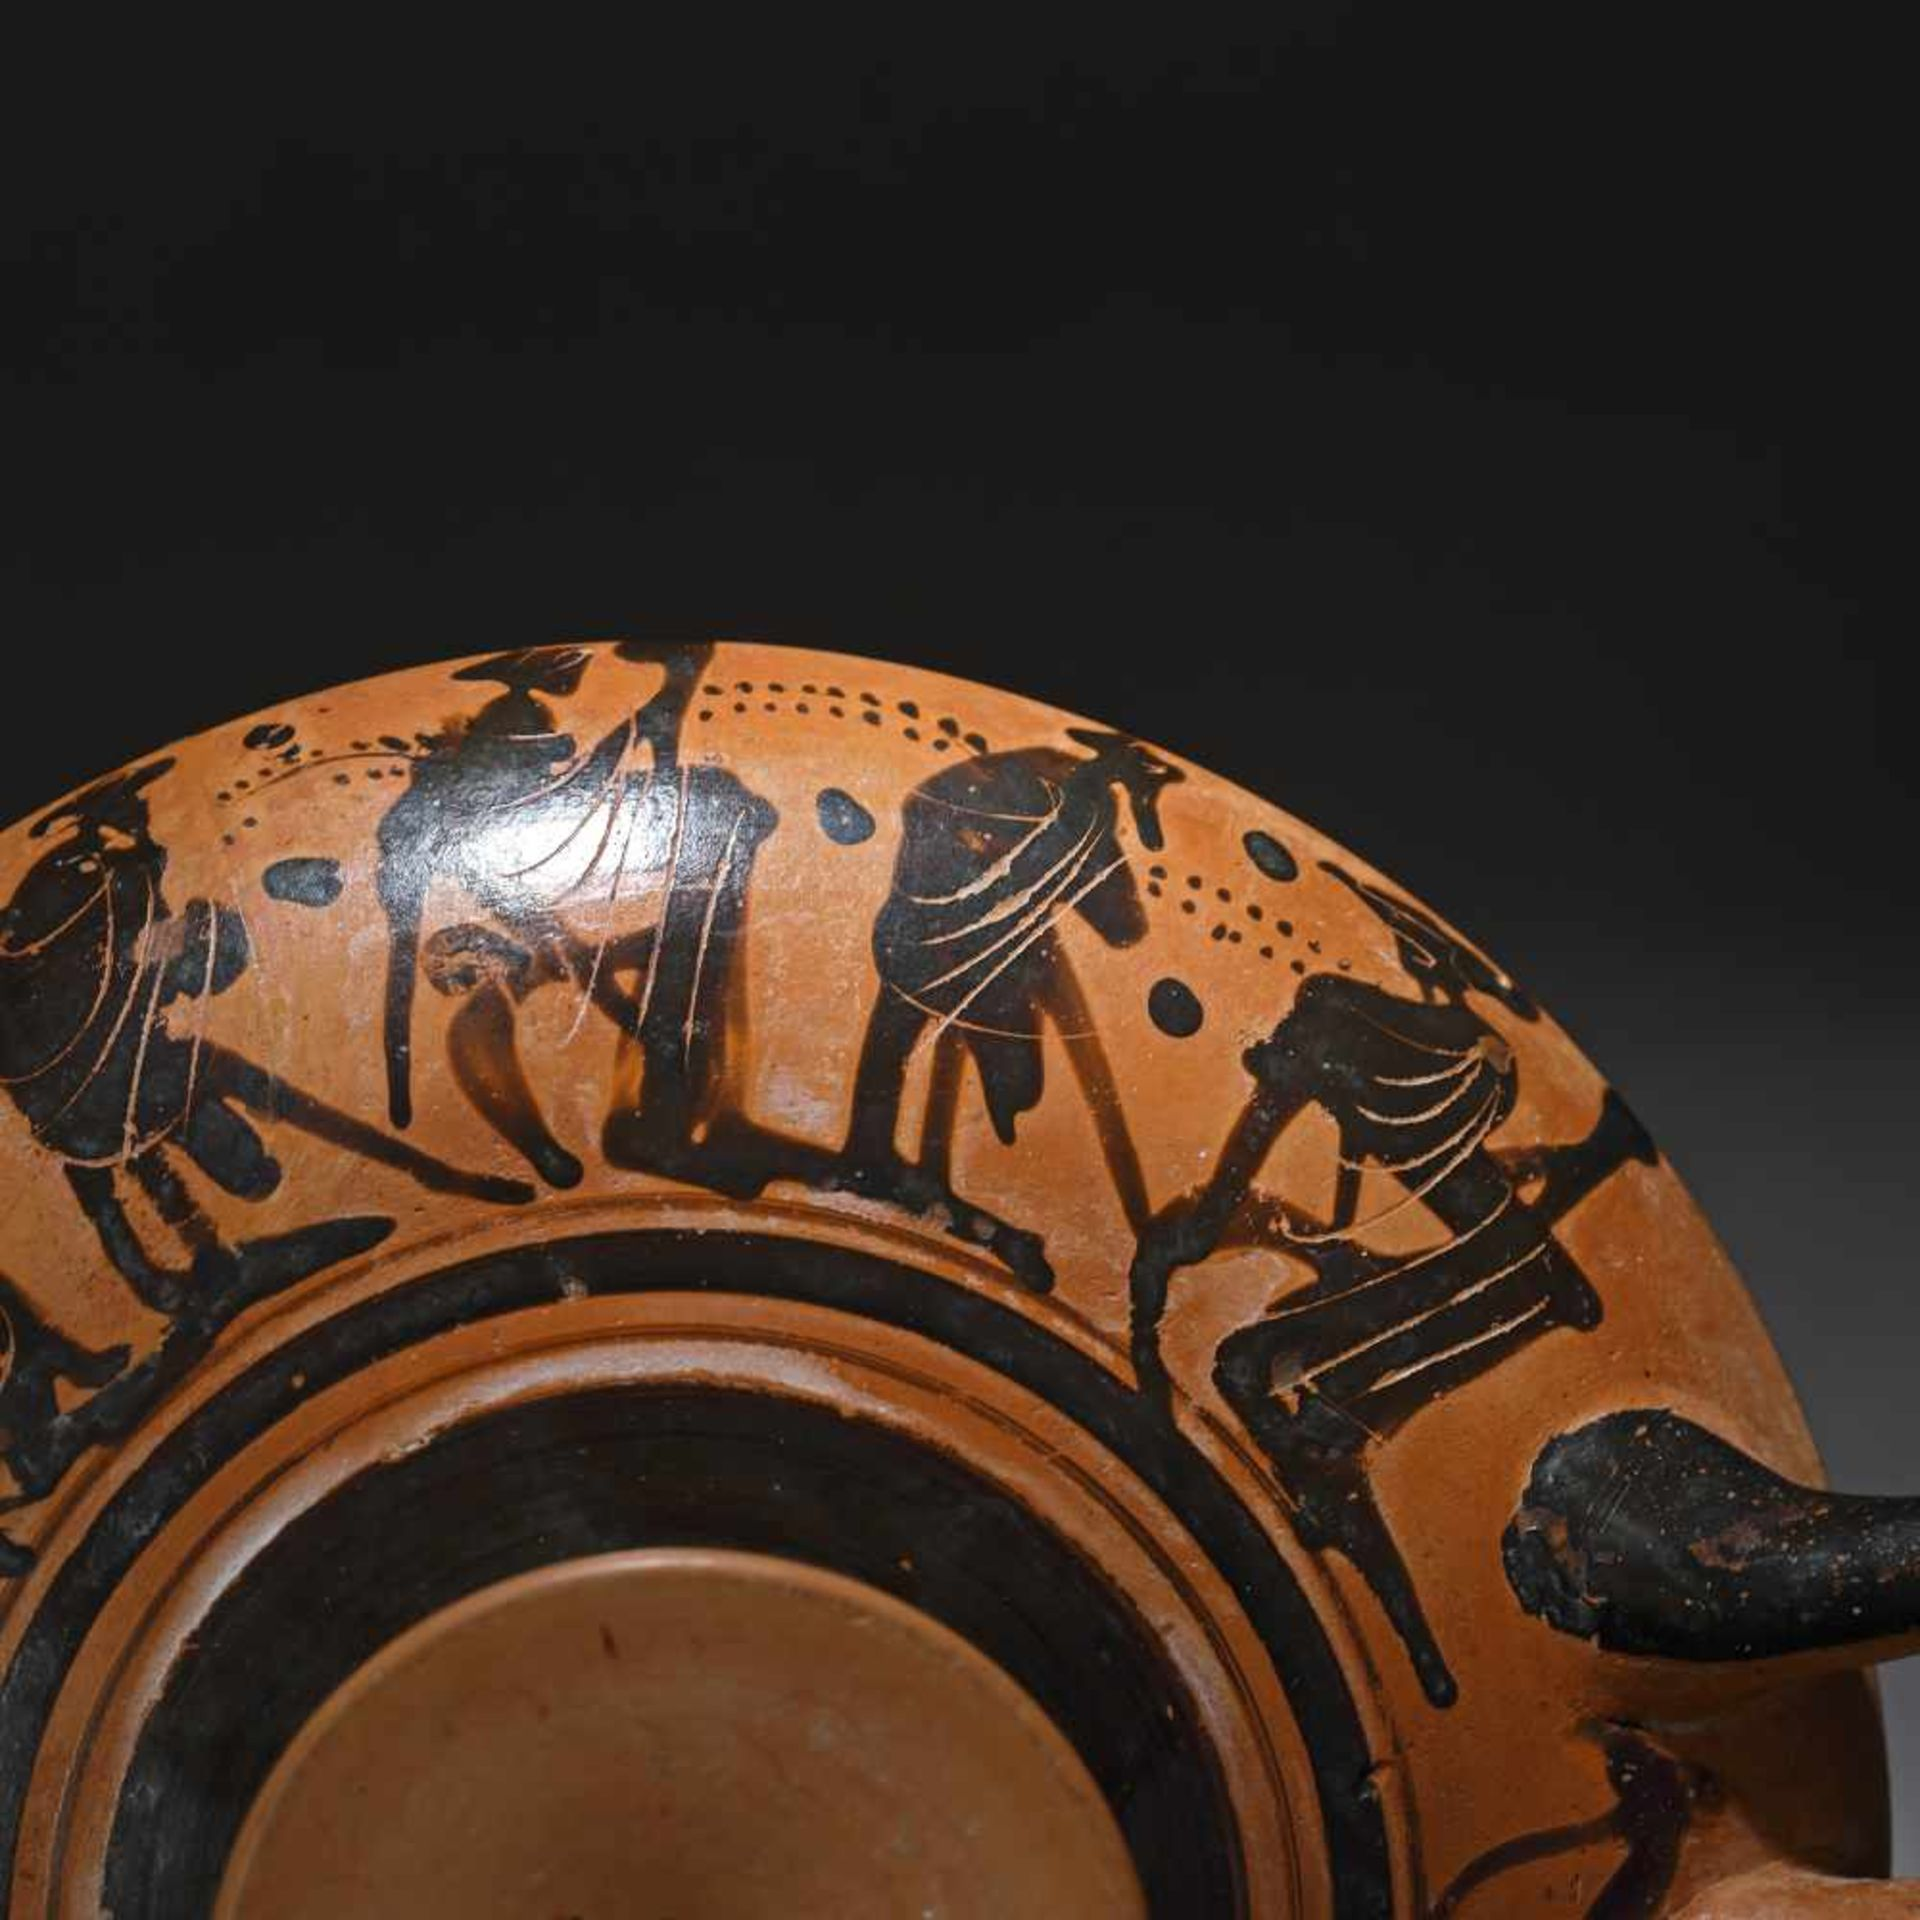 Kylix - ceramic wine jug, black-figure style, Classical Greece, approx. 2,400 years old, 4th century - Bild 4 aus 7